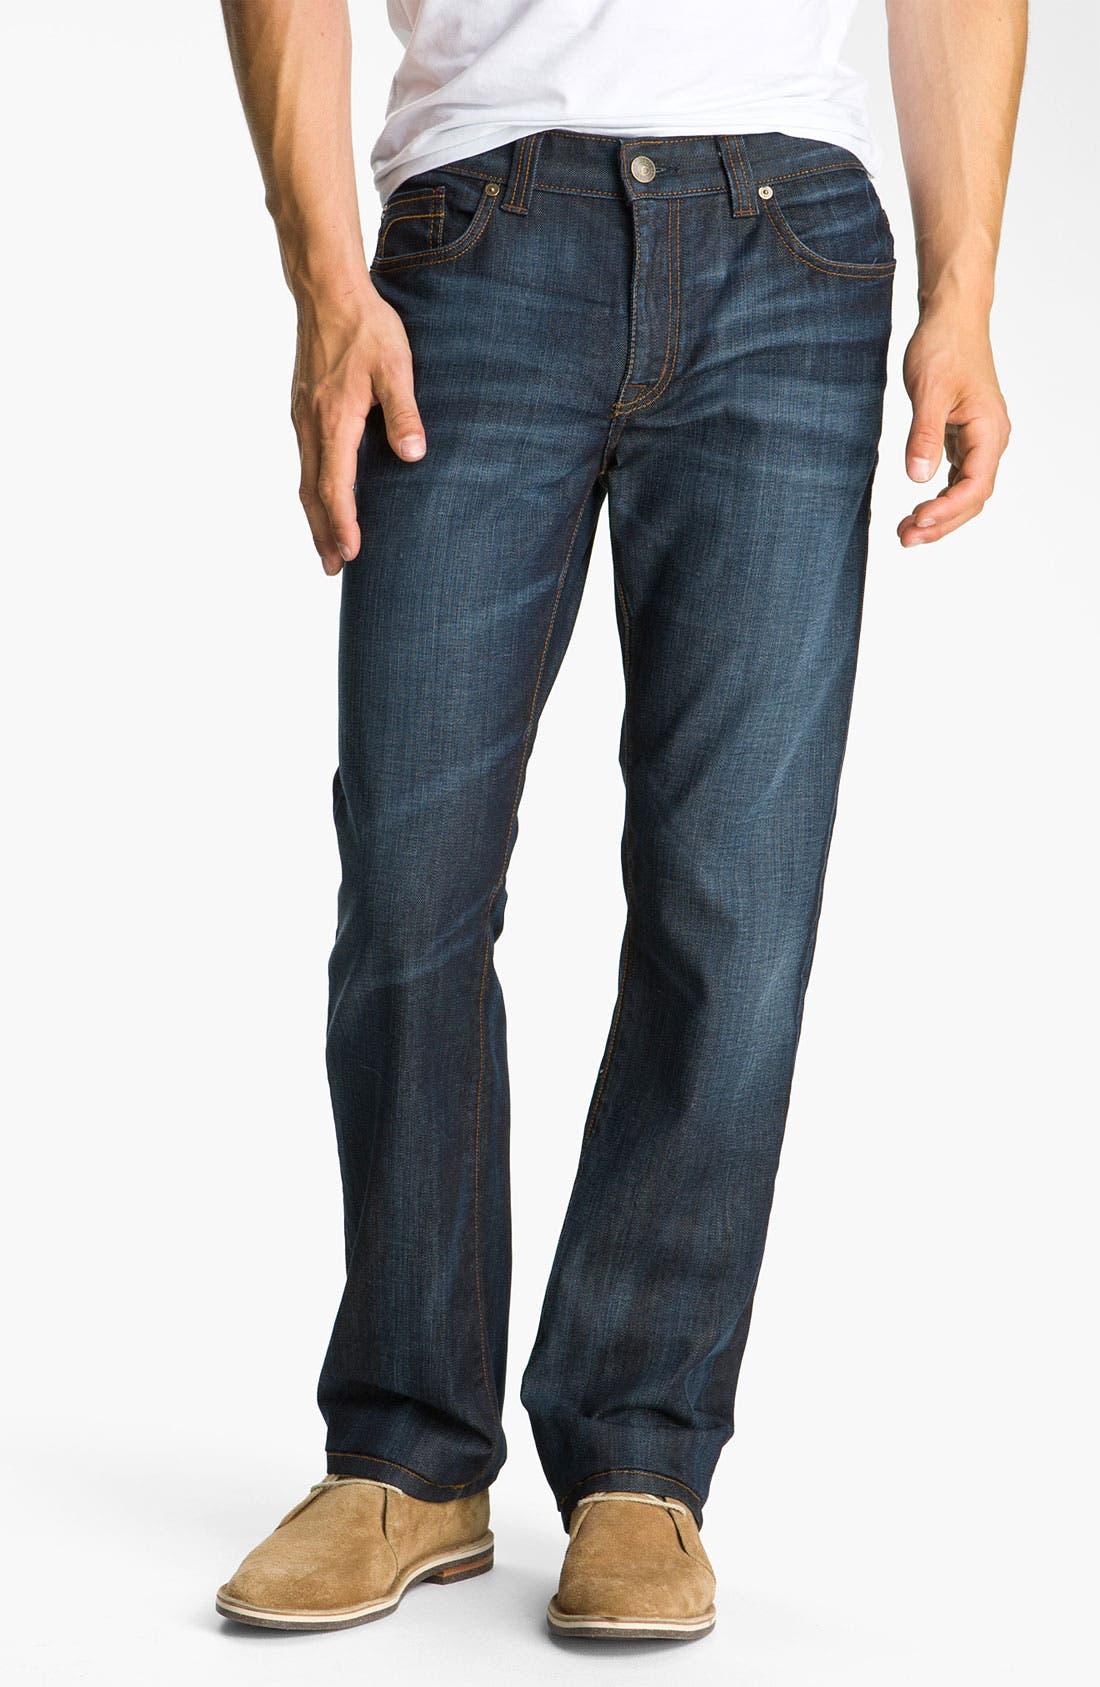 Alternate Image 1 Selected - Fidelity Denim 'Impala' Slim Straight Leg Jeans (Altmont Dark Vintage)